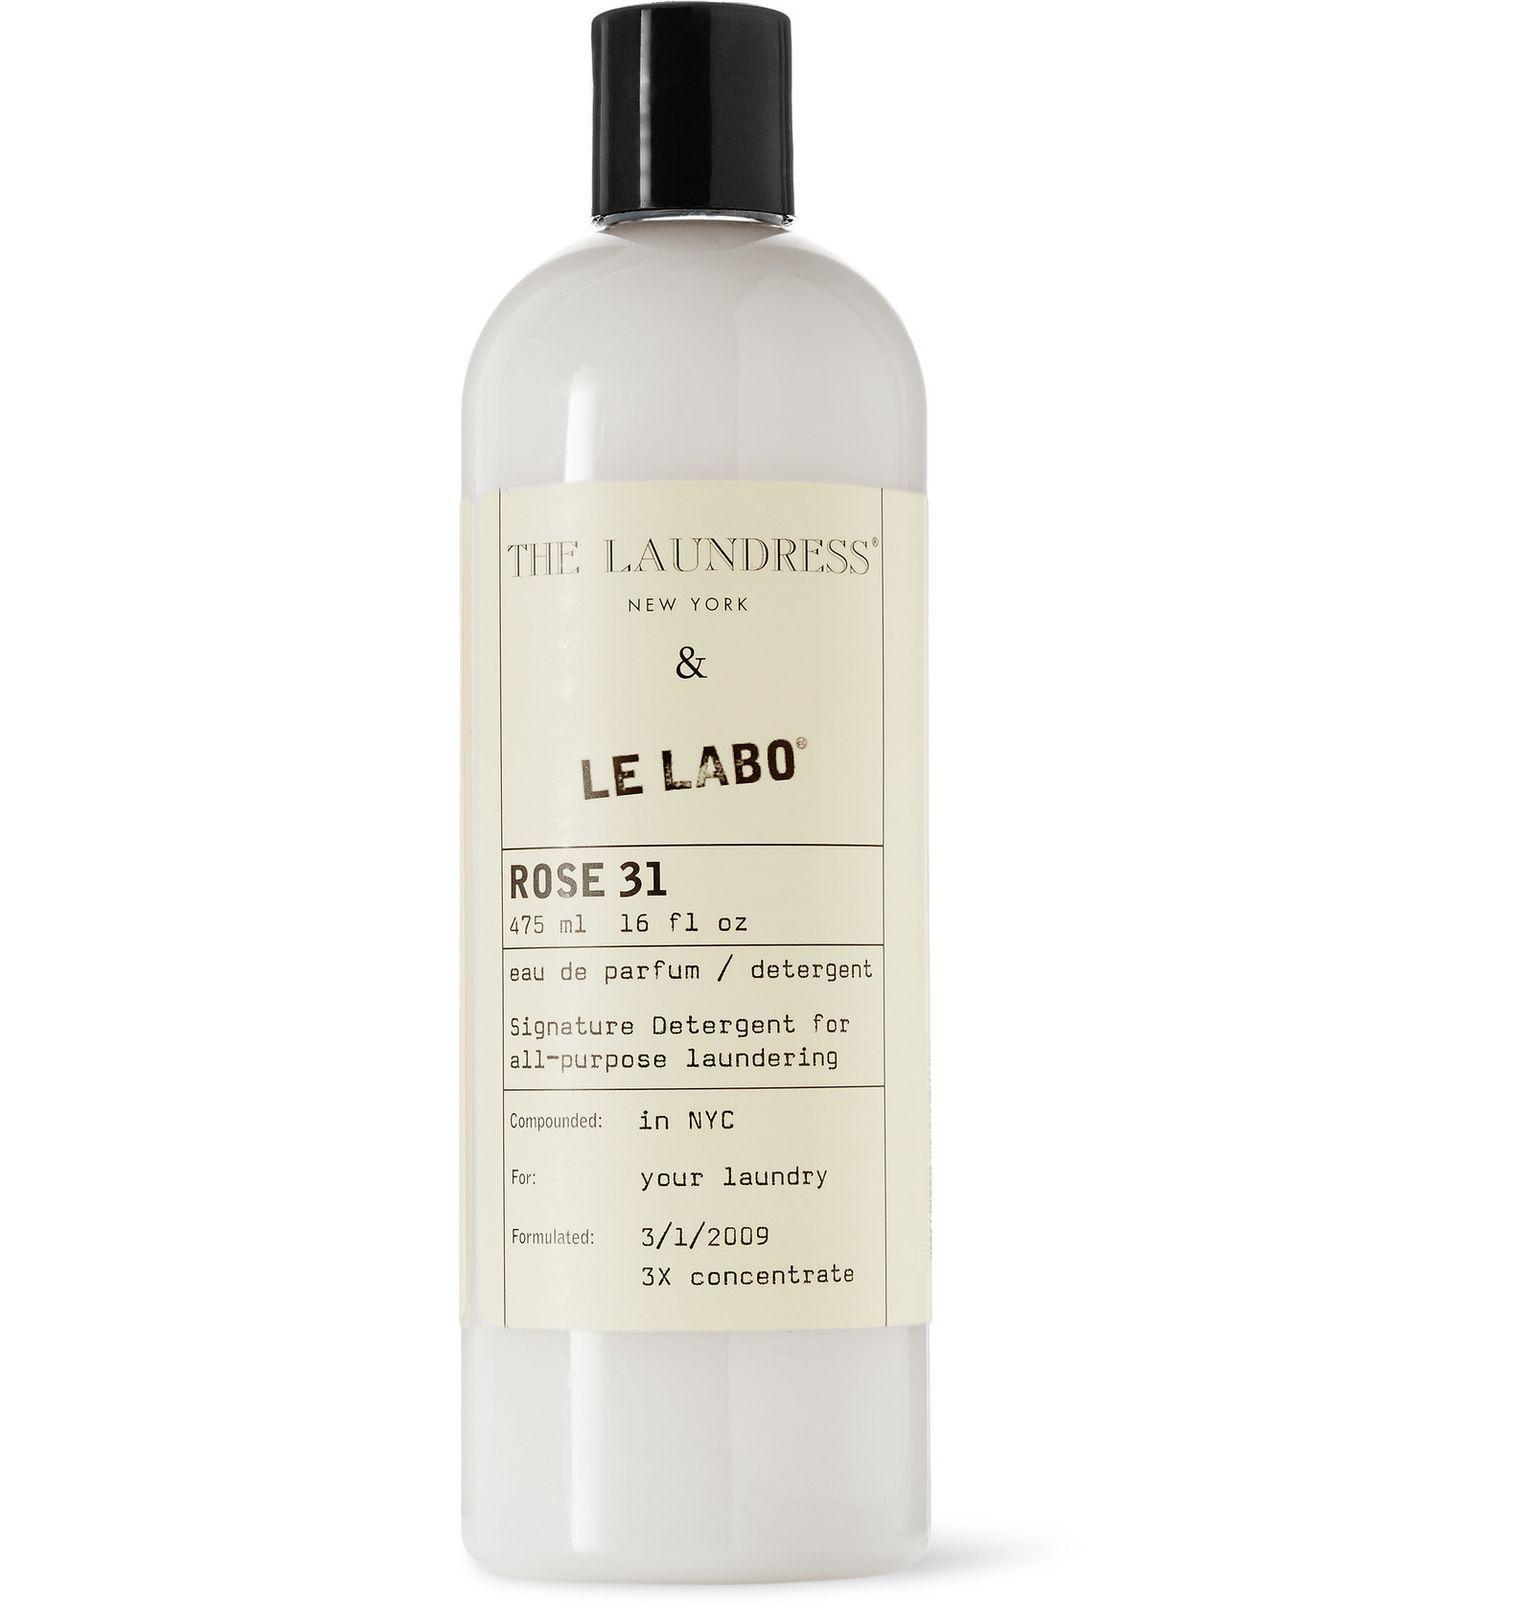 White Le Labo Rose 31 Signature Detergent 475ml The Laundress